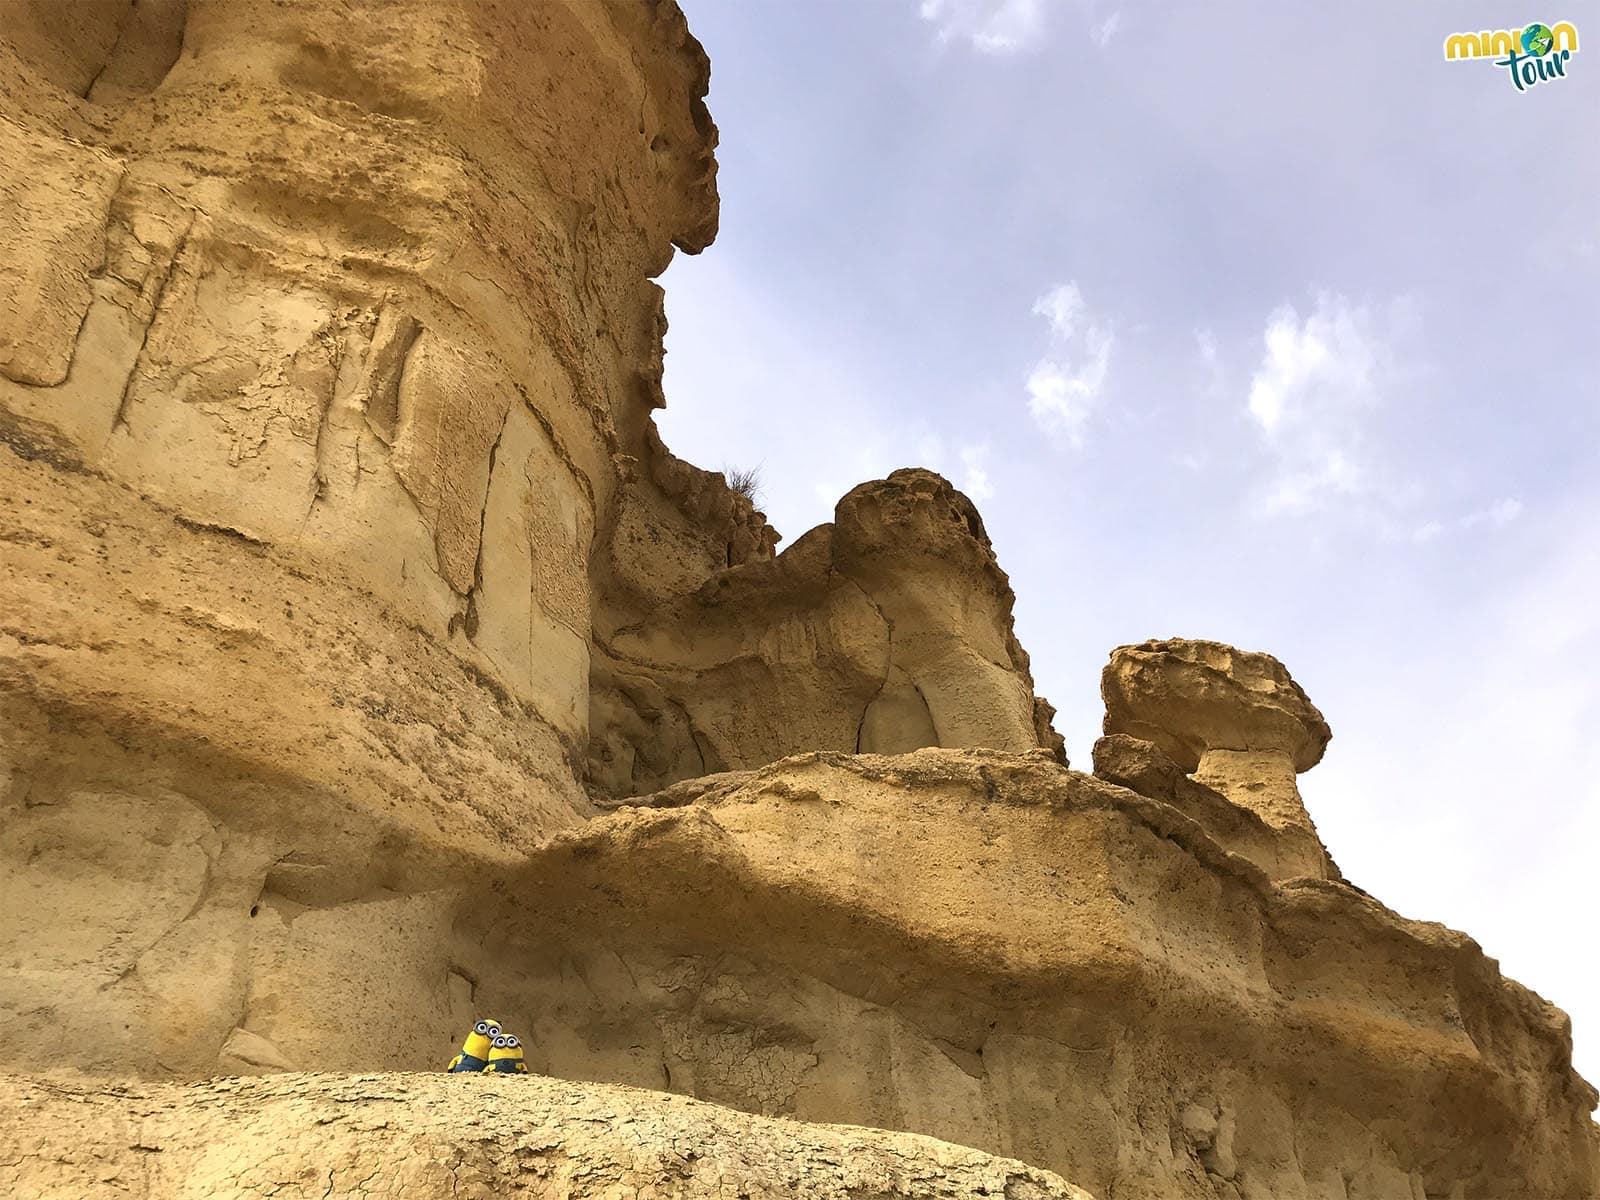 Investigando las erosiones de Bolnuevo